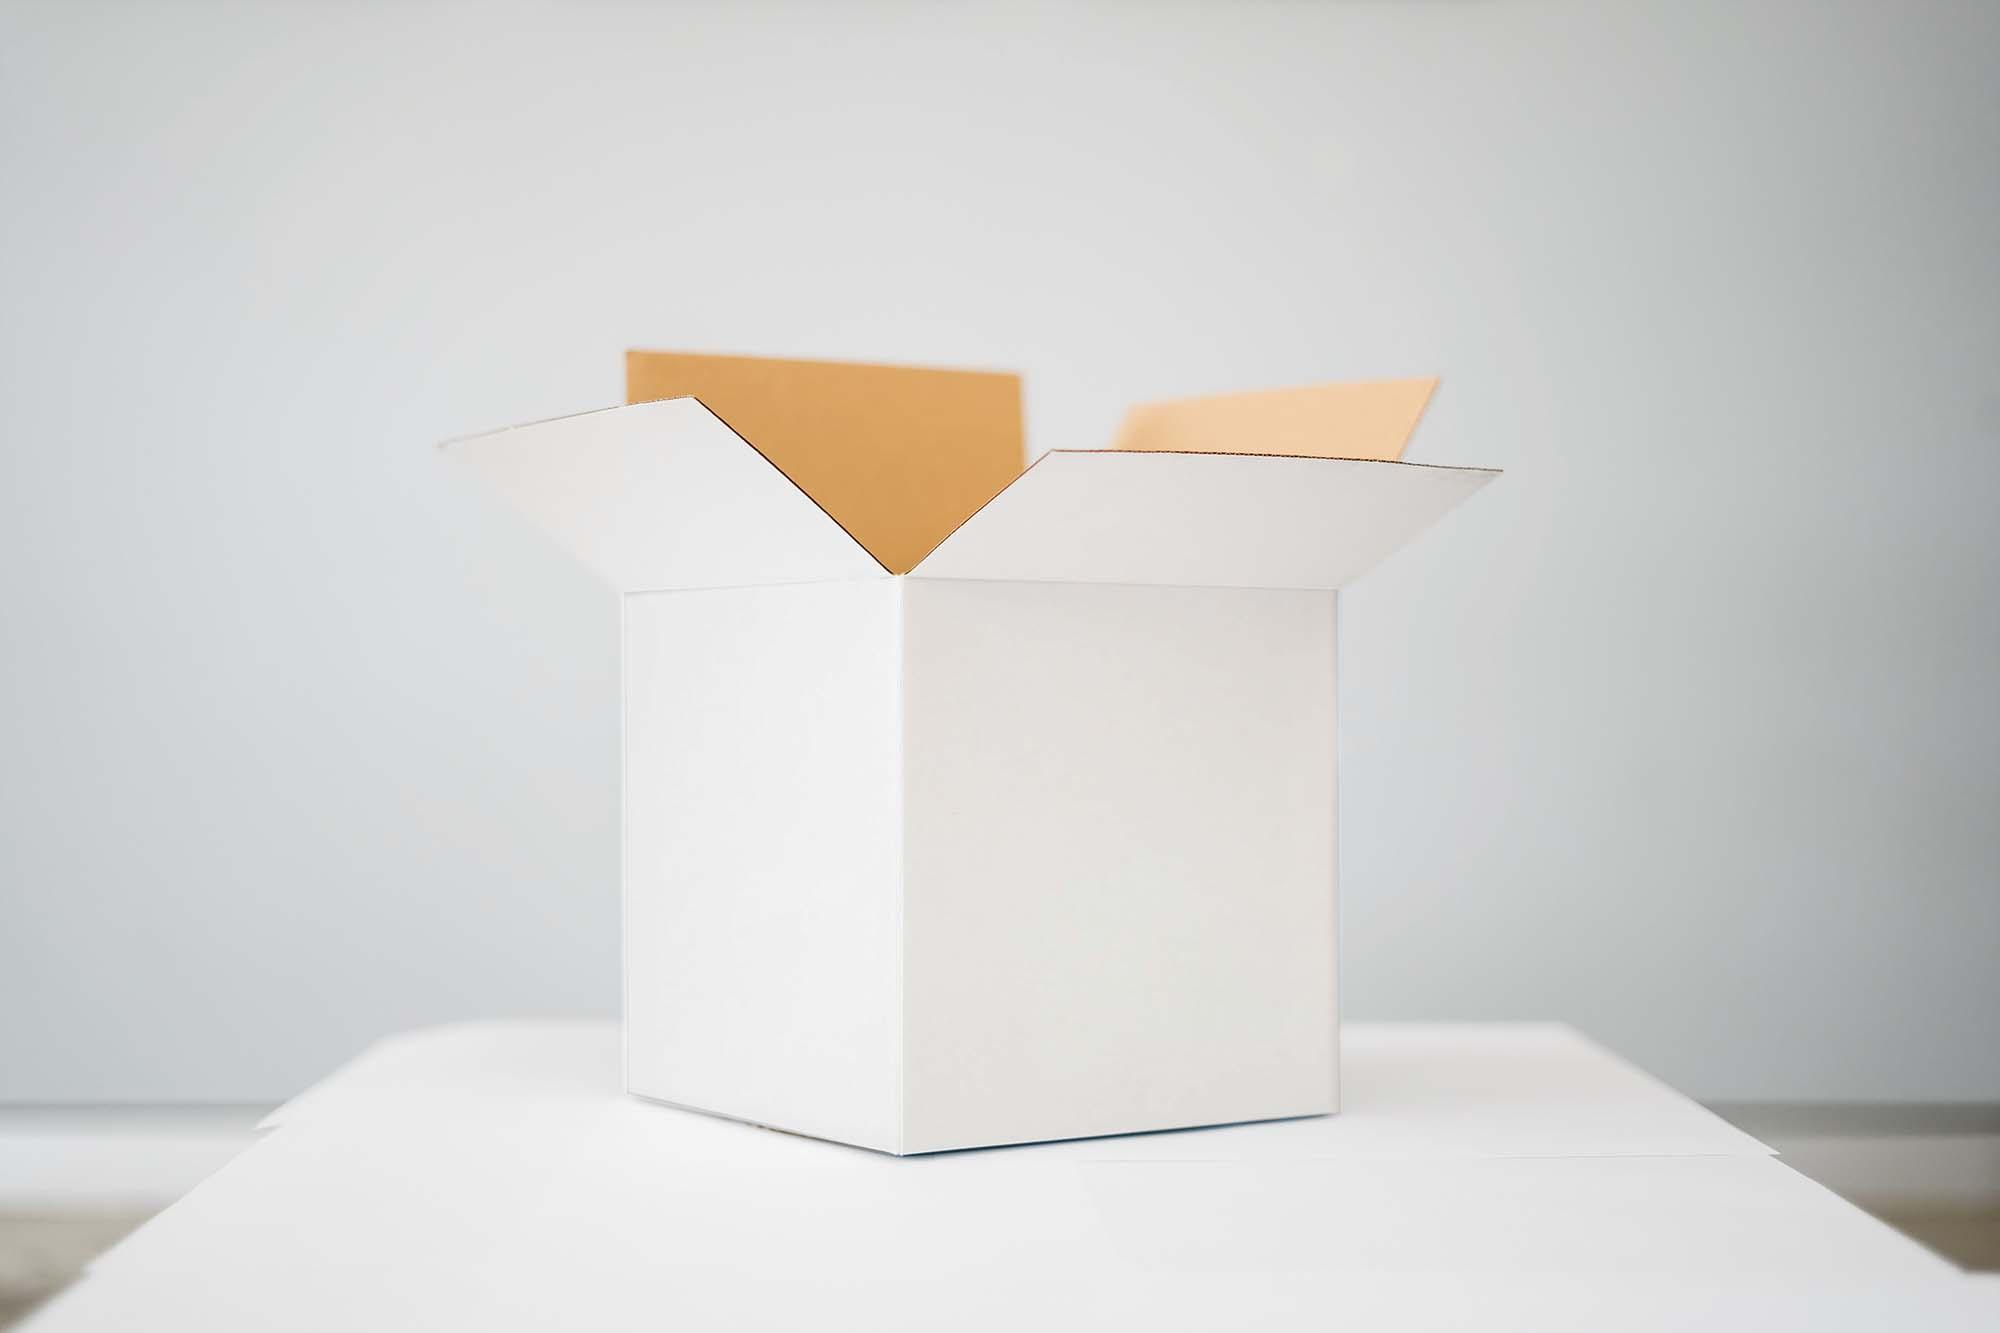 Perspective Box Mockup 2